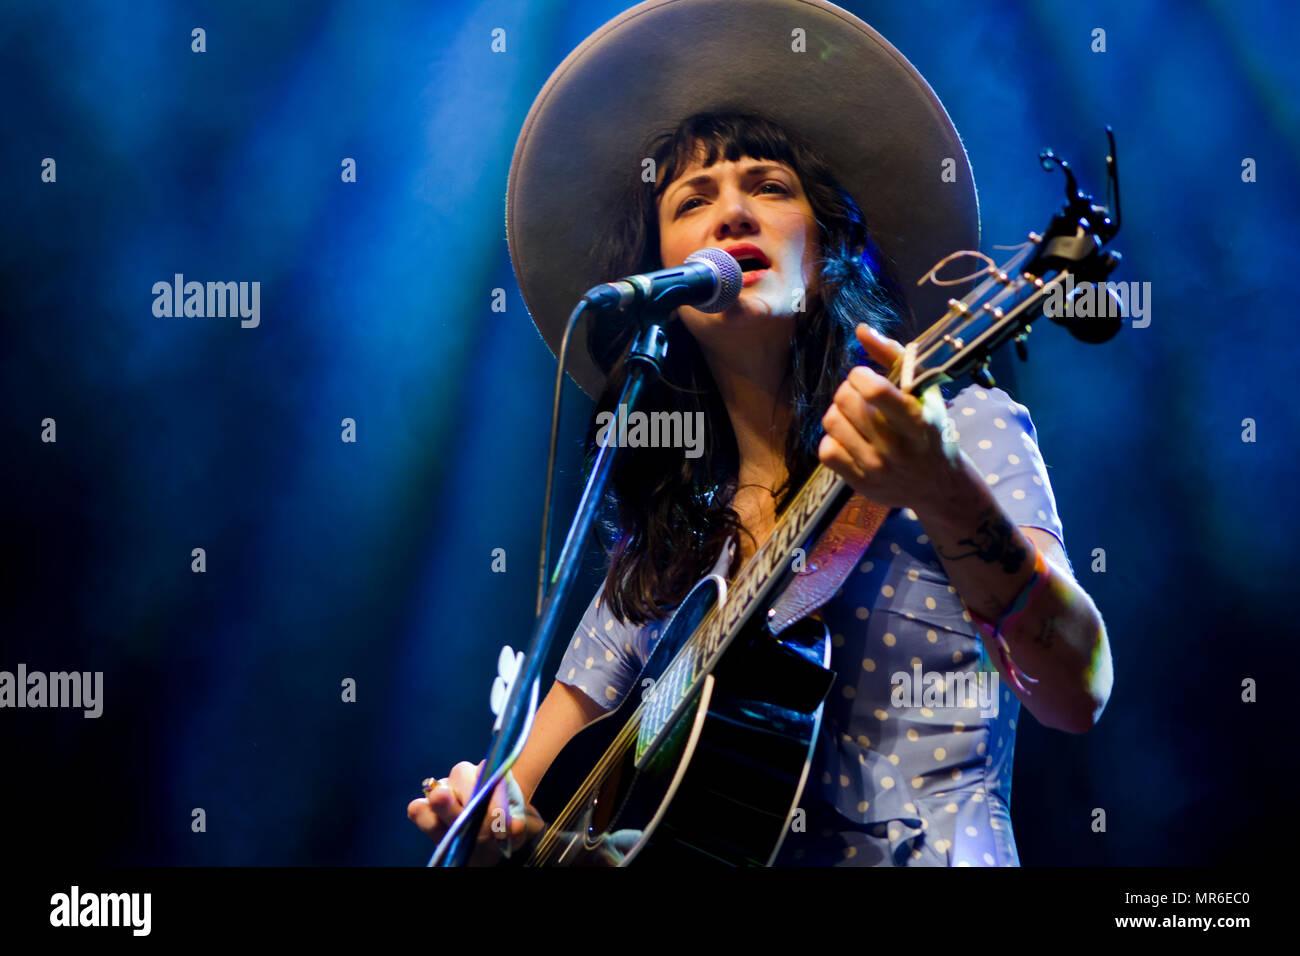 Nikki Lane performs in live concert - Stock Image